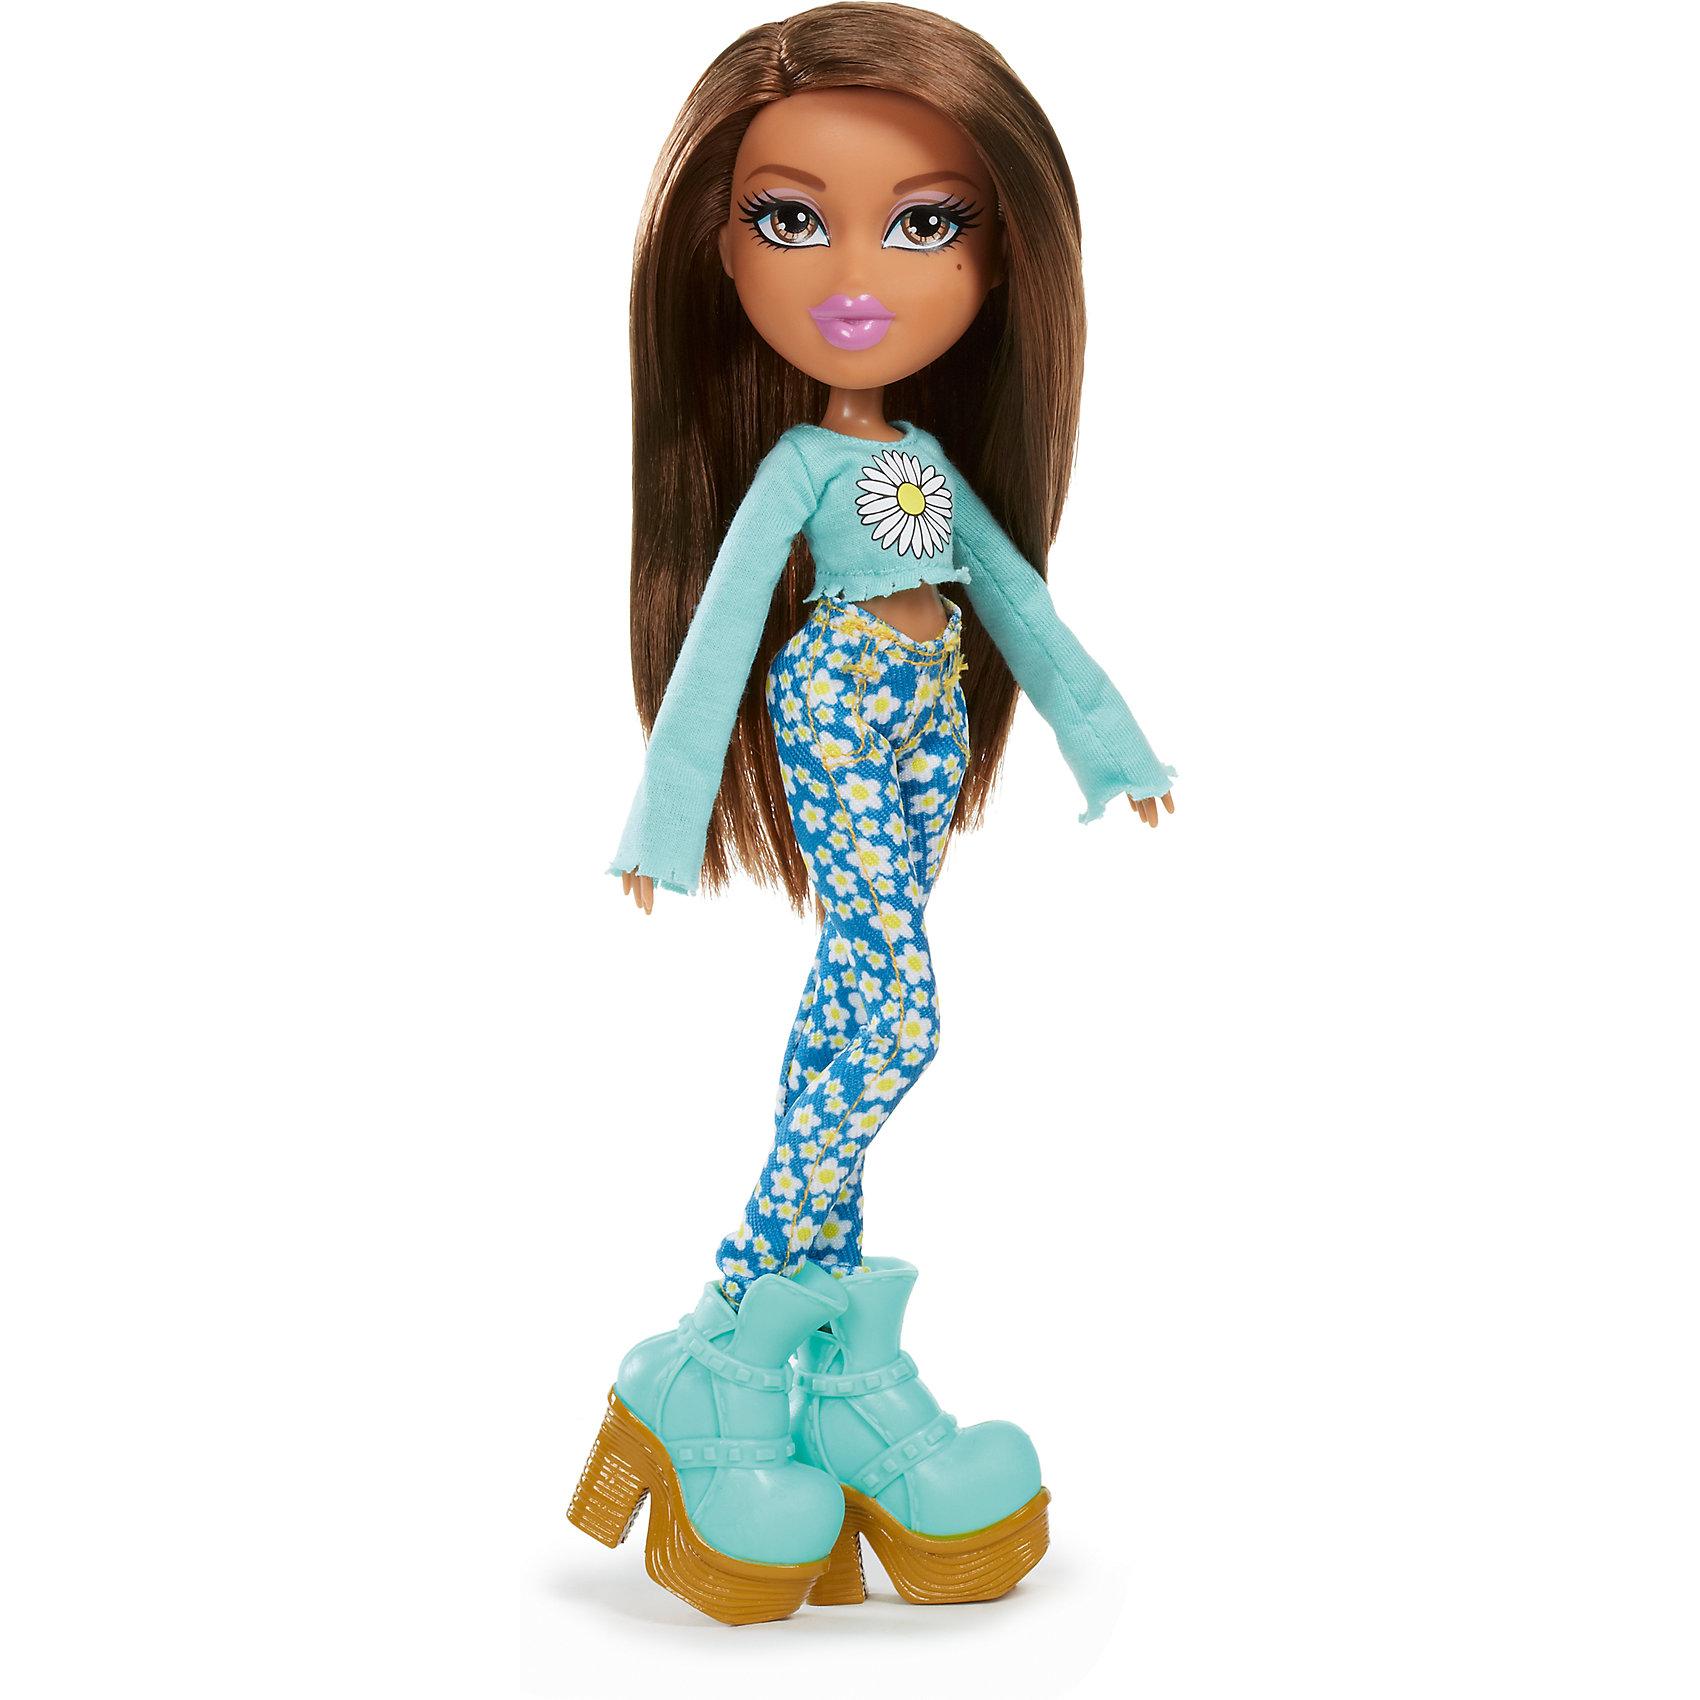 BRATZ Кукла делюкс Жасмин, Диджей, Bratz куклы gulliver кукла дынька 30см